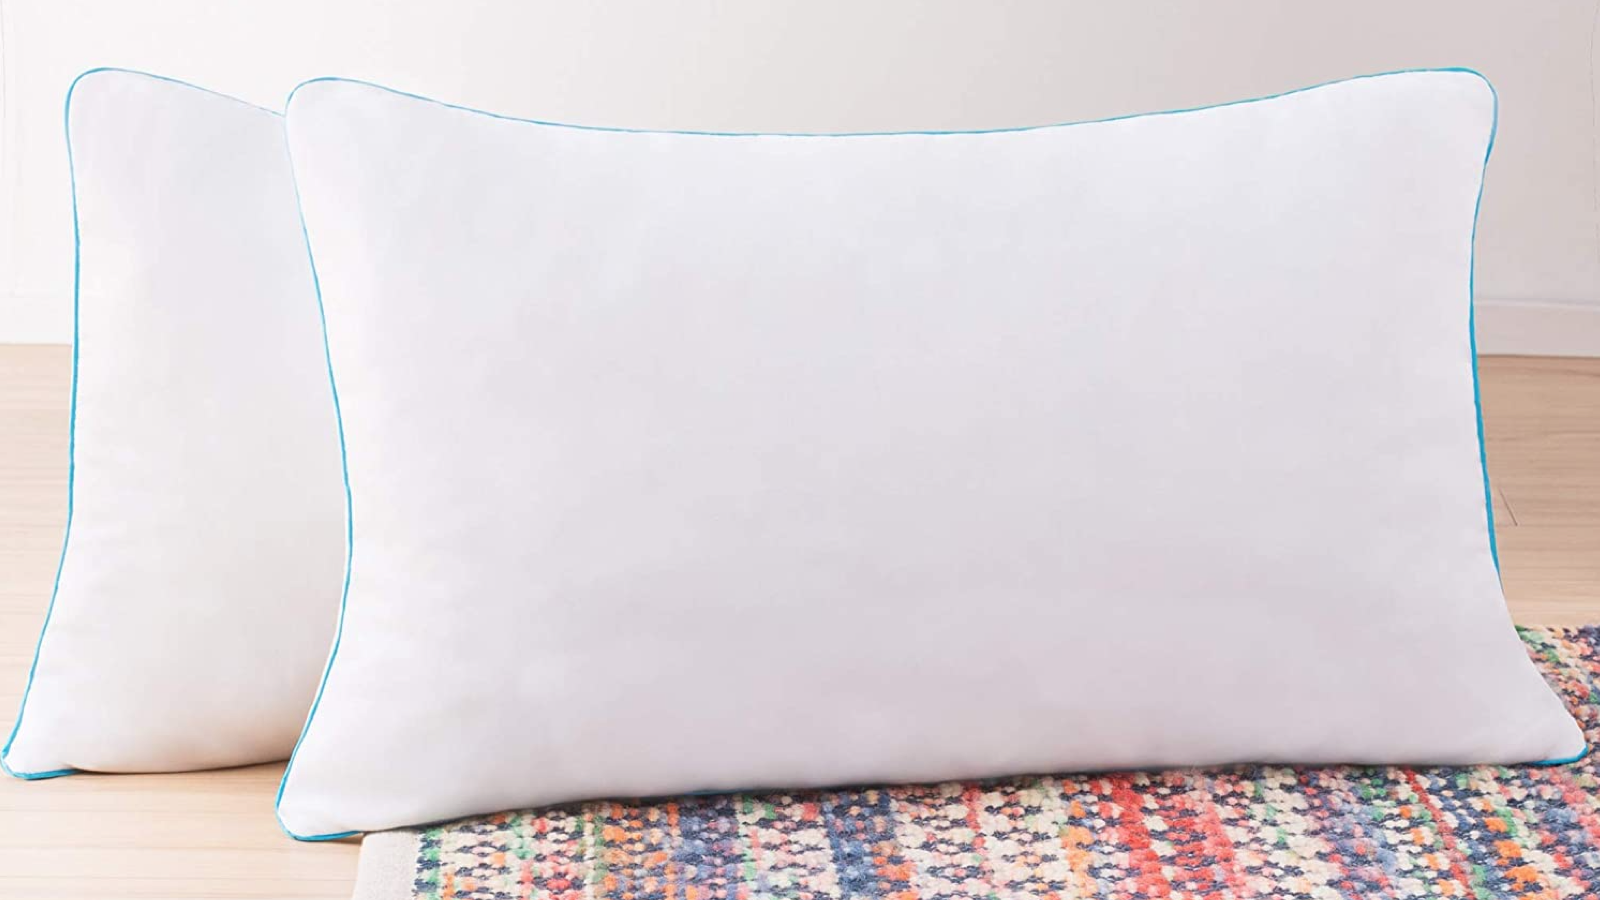 two memory foam pillows in white pillowcases